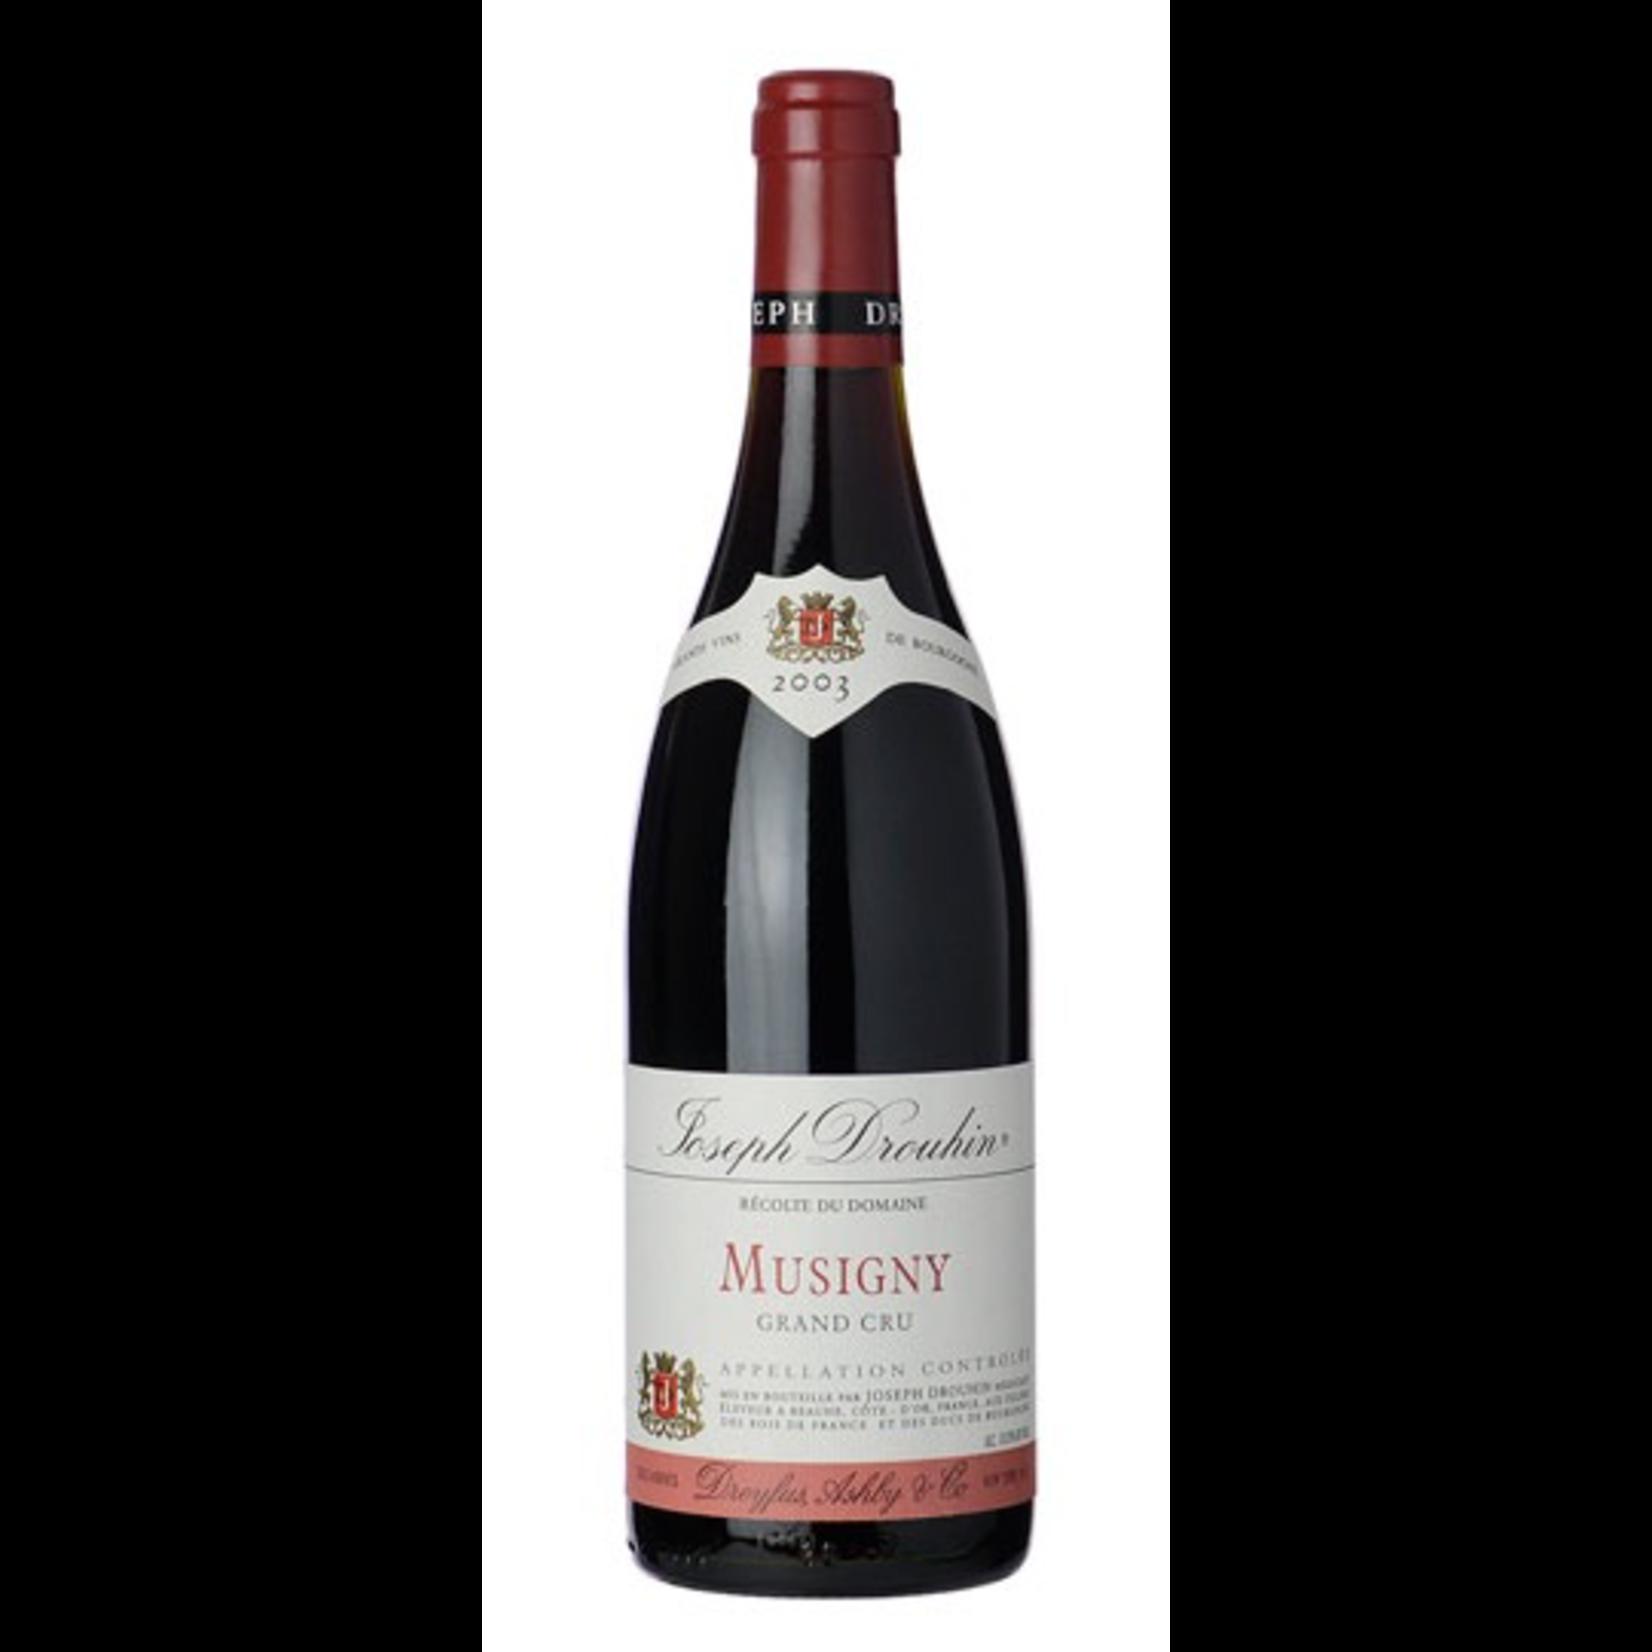 Wine Joseph Drouhin Musigny Grand Cru 2003